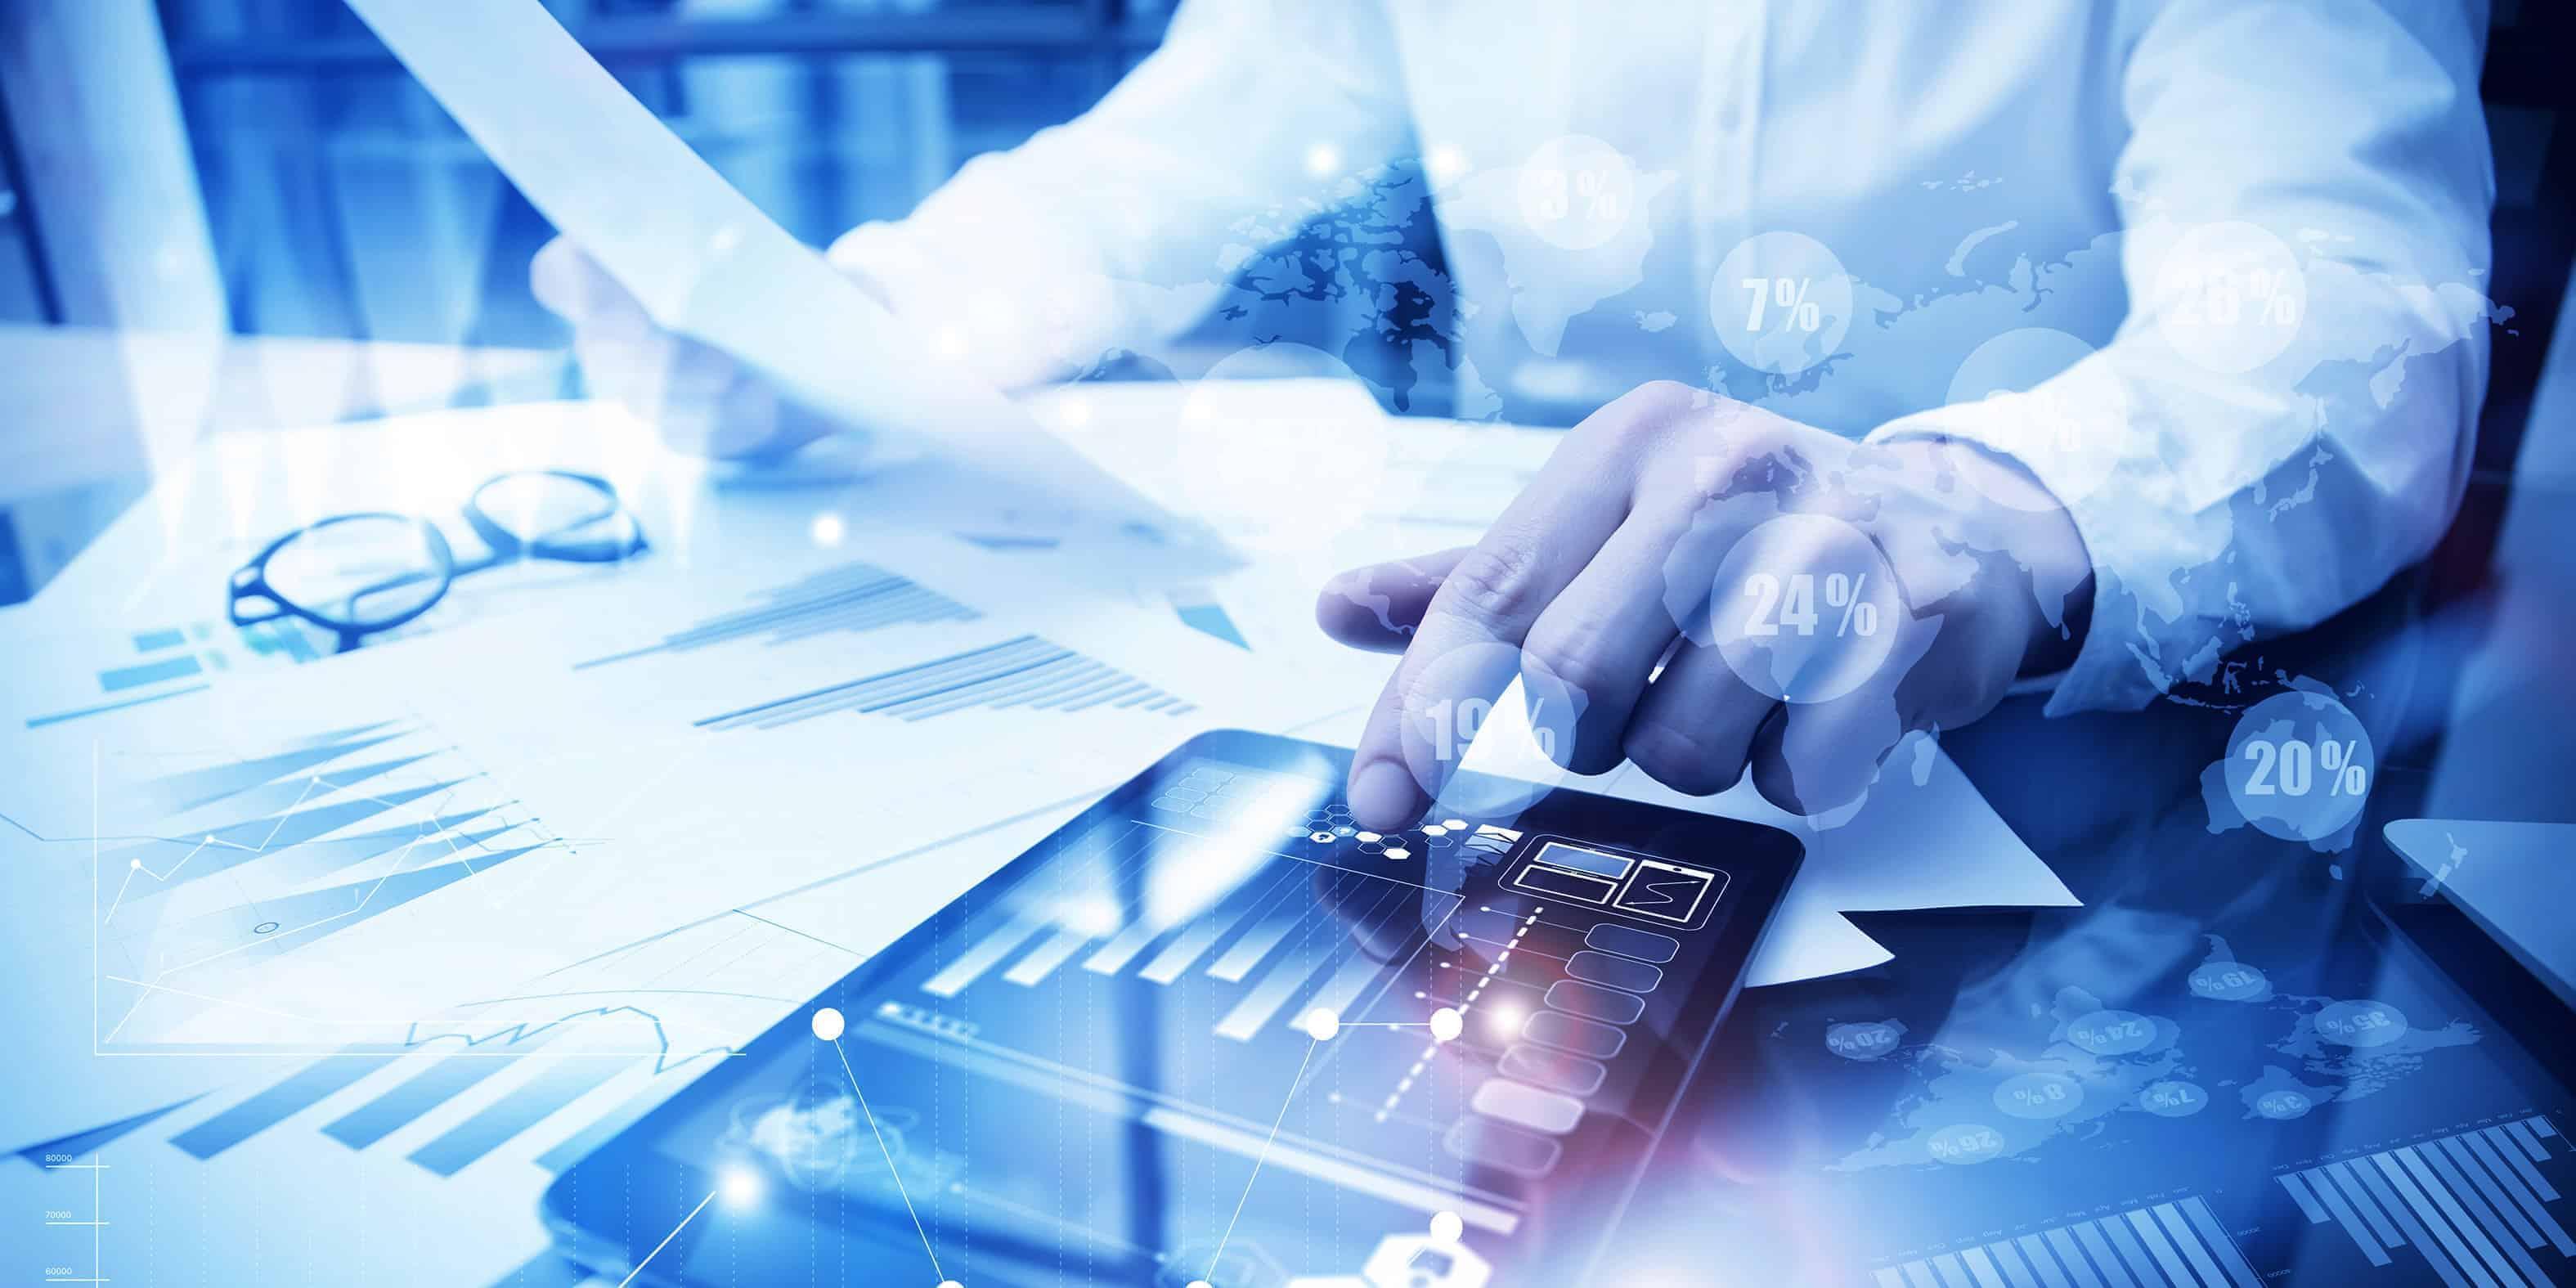 FIDAS Steuerberatung - Digital Accounting